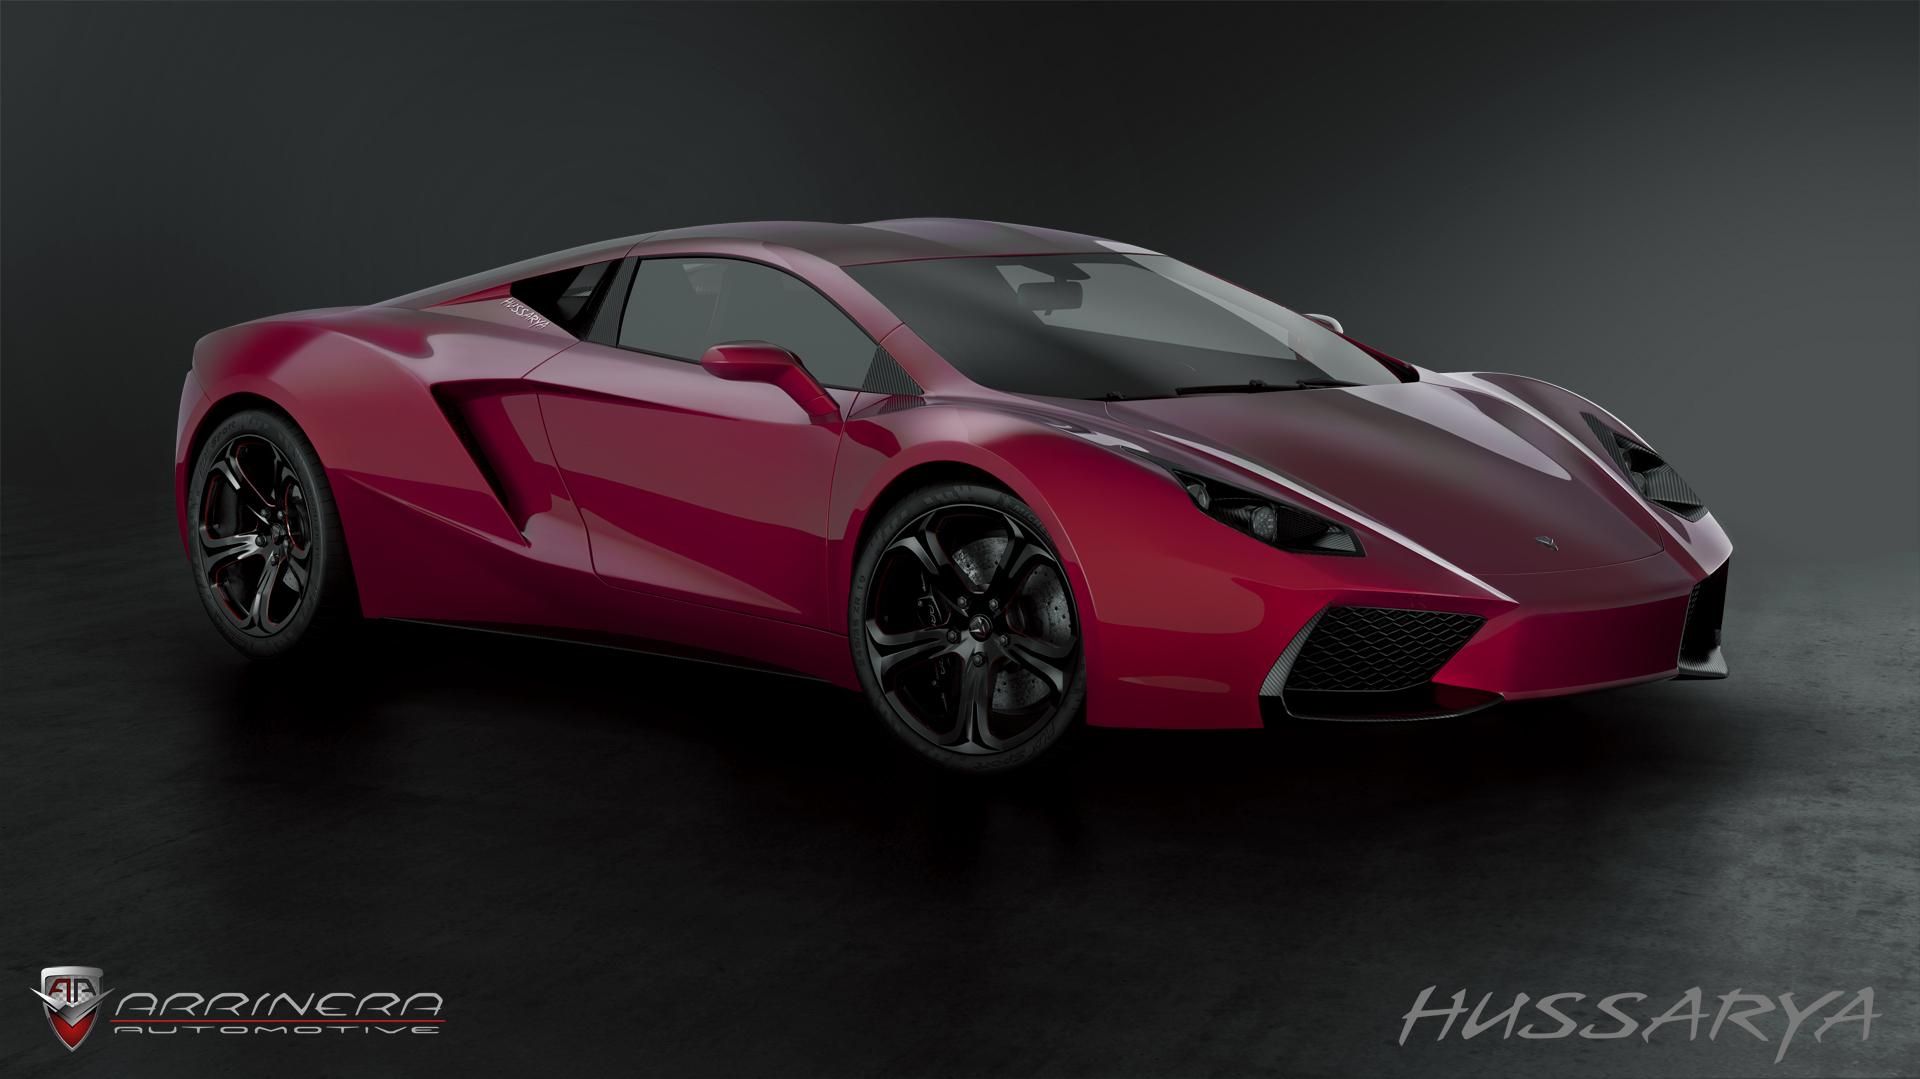 Arrinera Gives Its Super Car The Name Hussarya News Autoviva Com